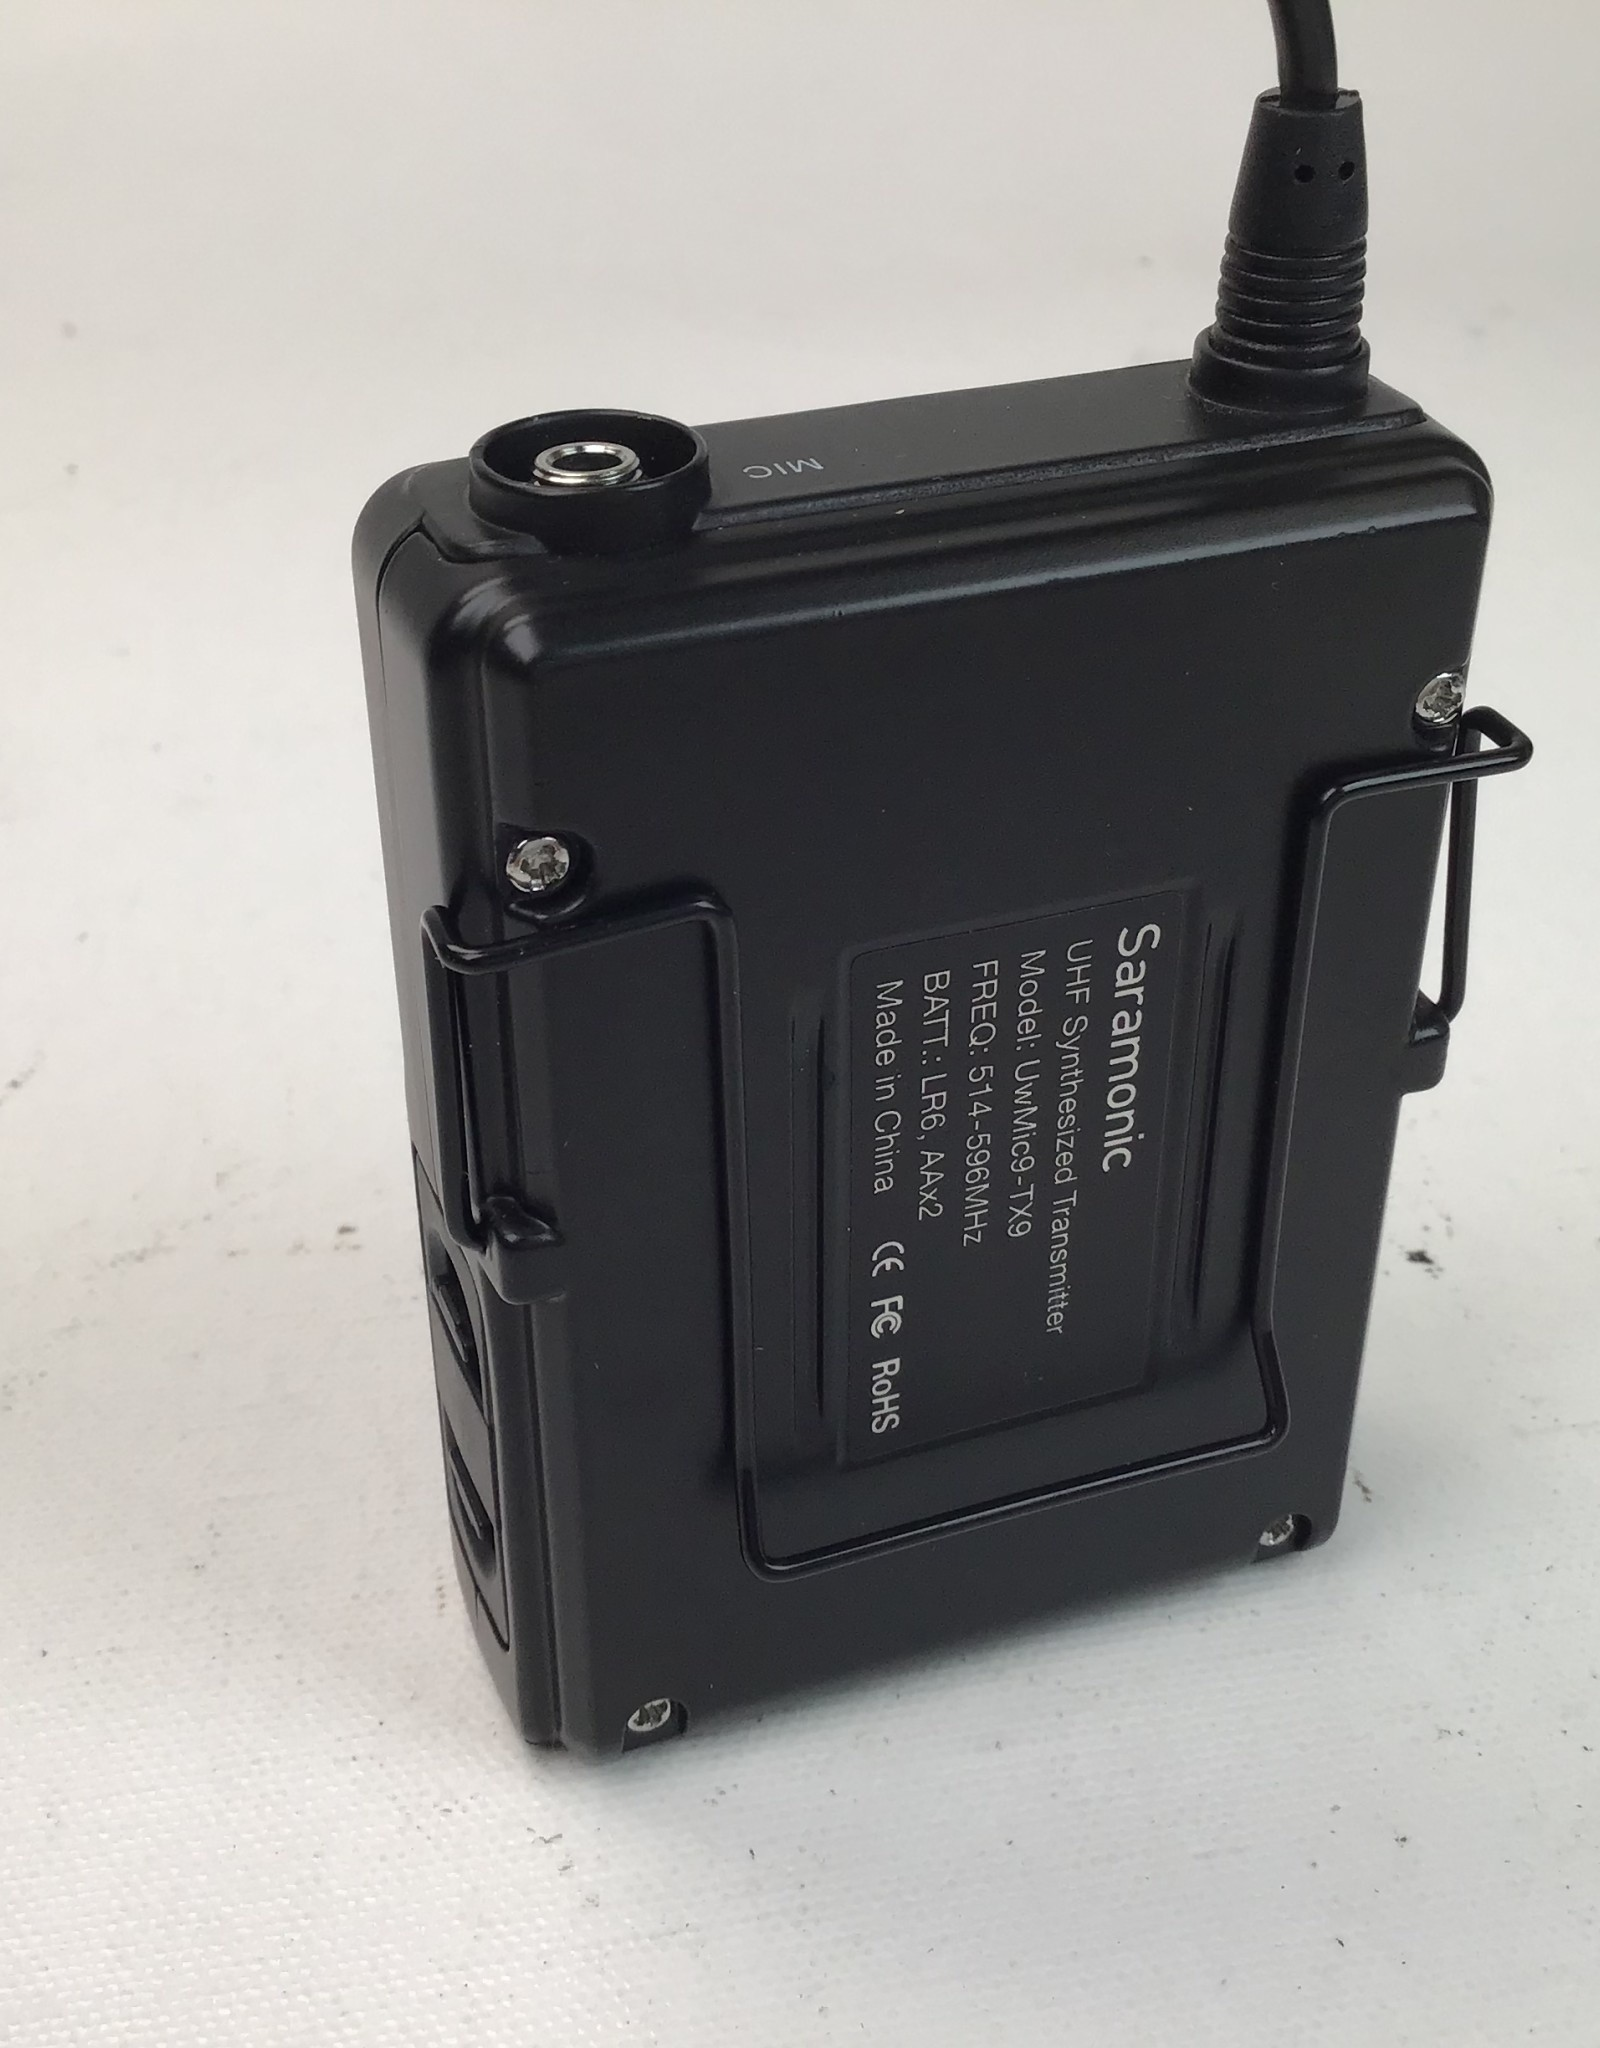 SARAMONIC UWMIC9TX9 - Transmitter W/LAV Used Good